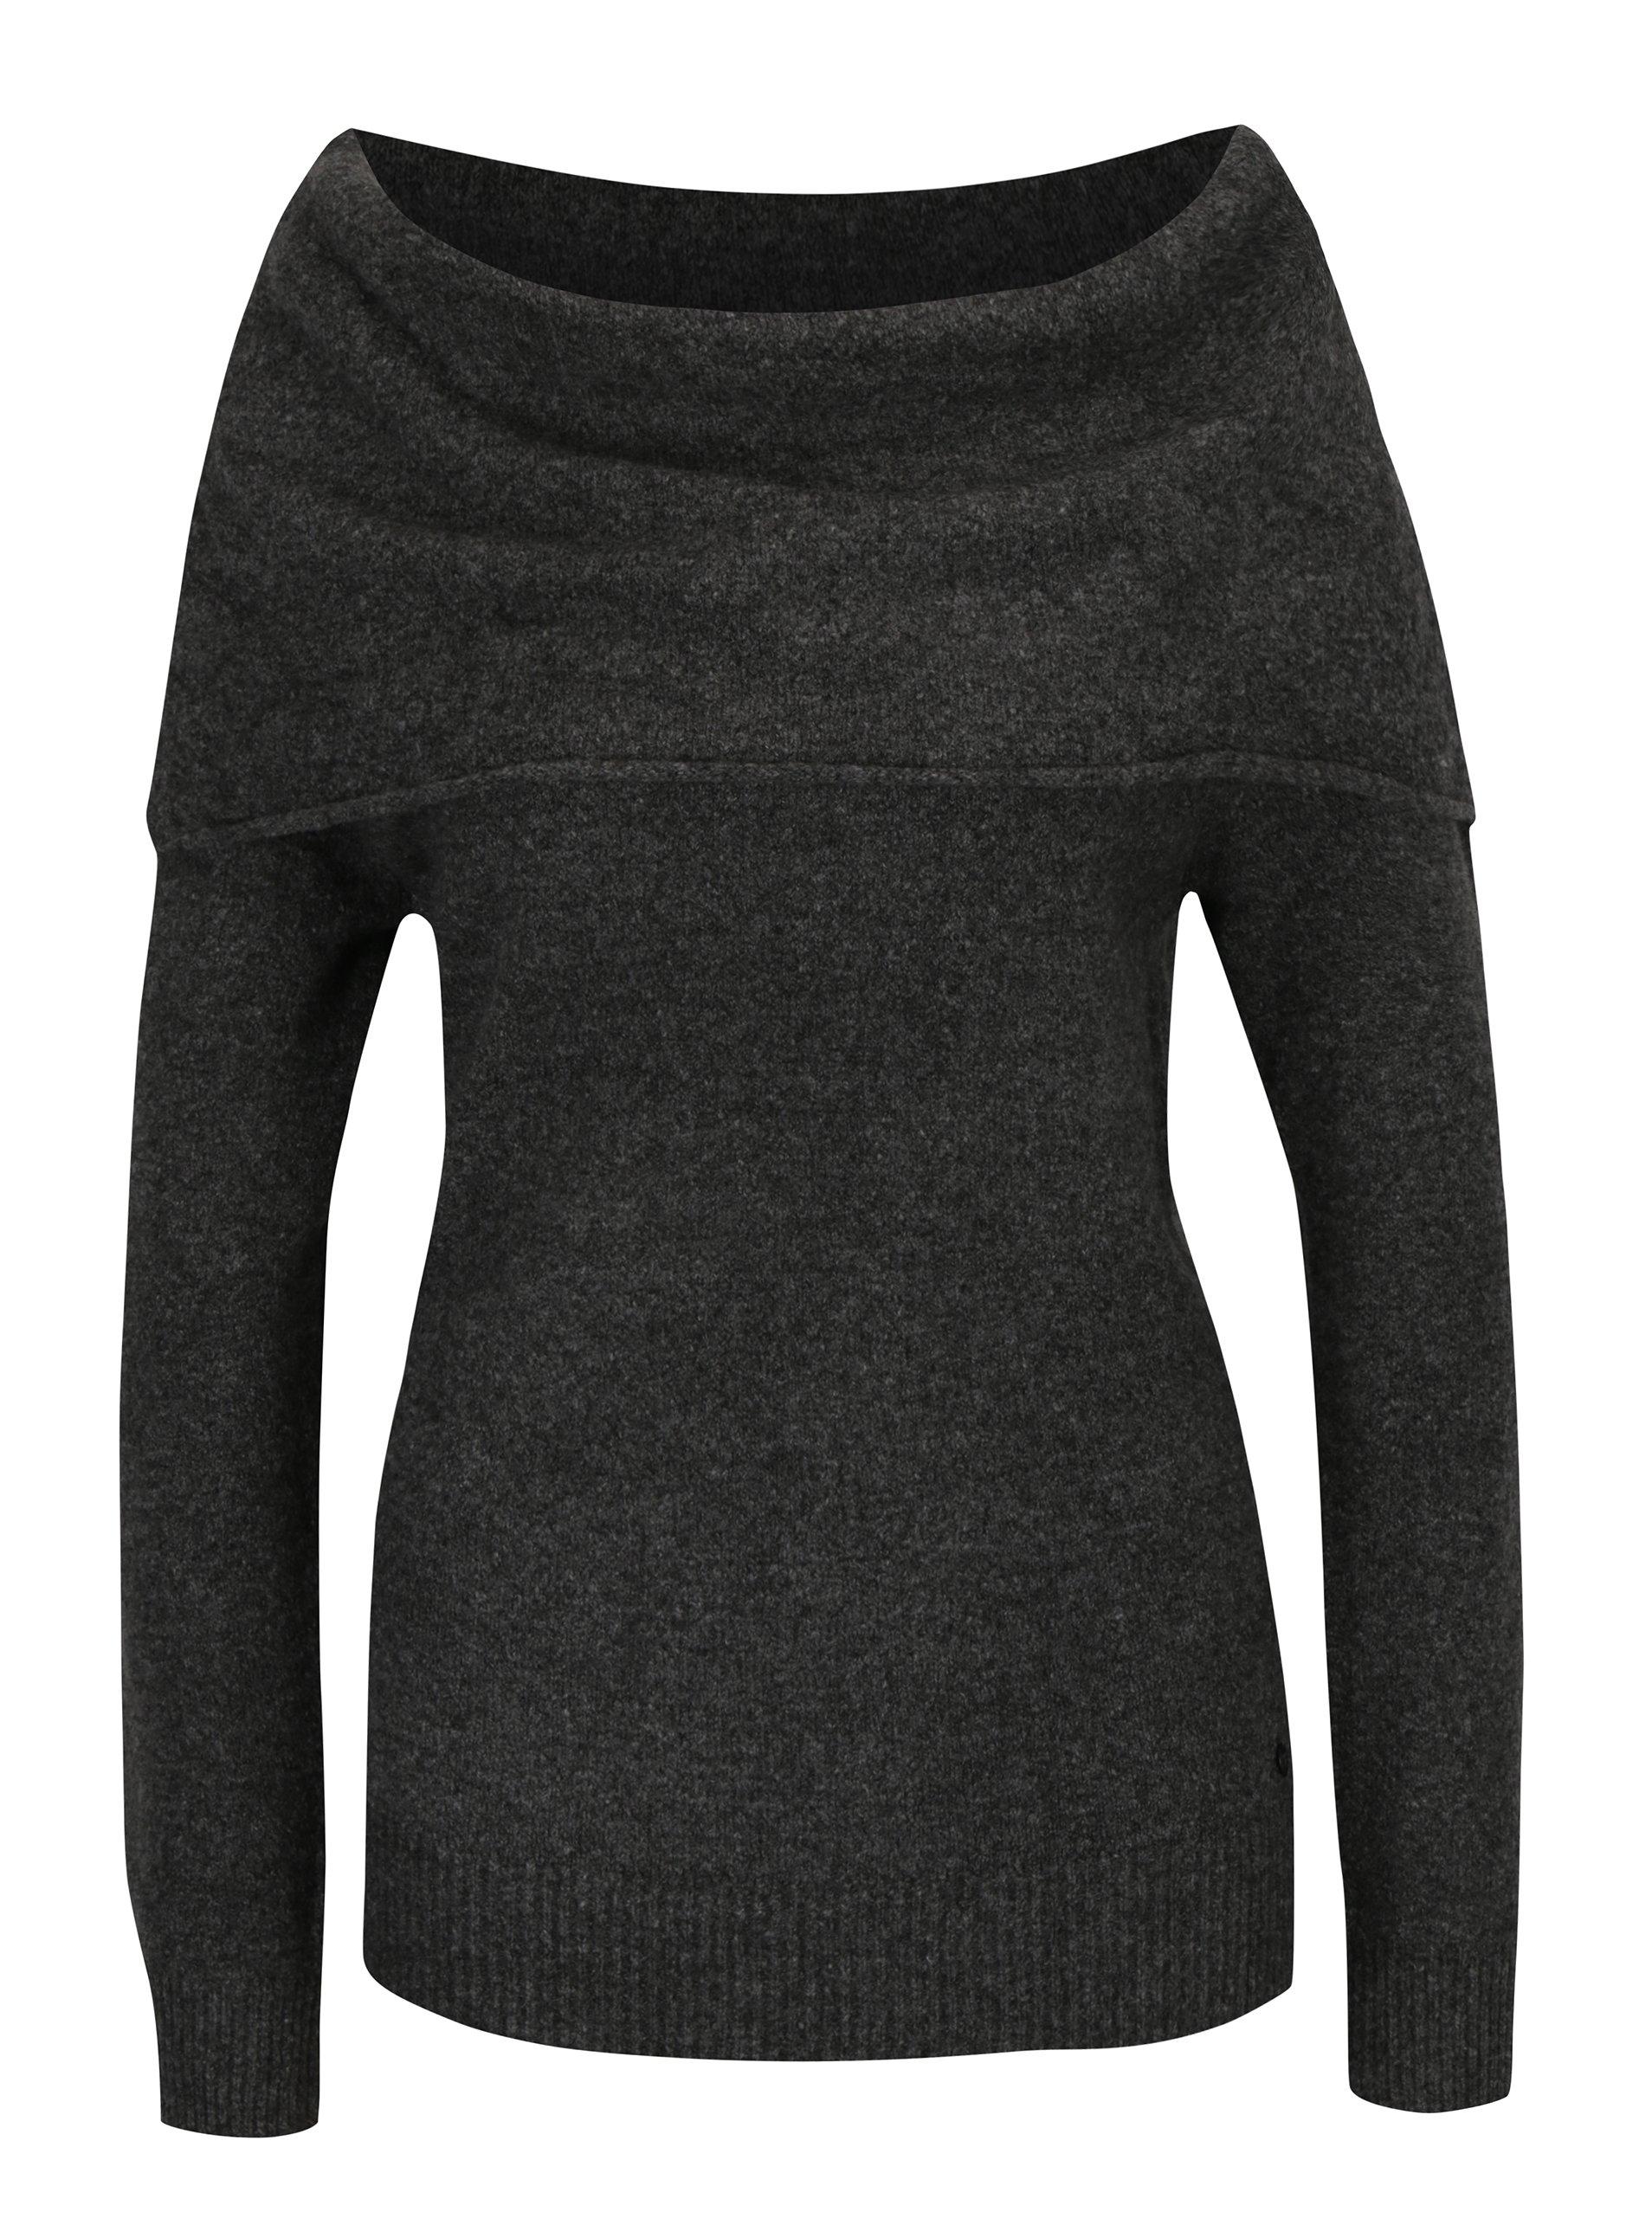 be265c27f8f Šedý dámský svetr s lodičkovým výstřihem Garcia Jeans